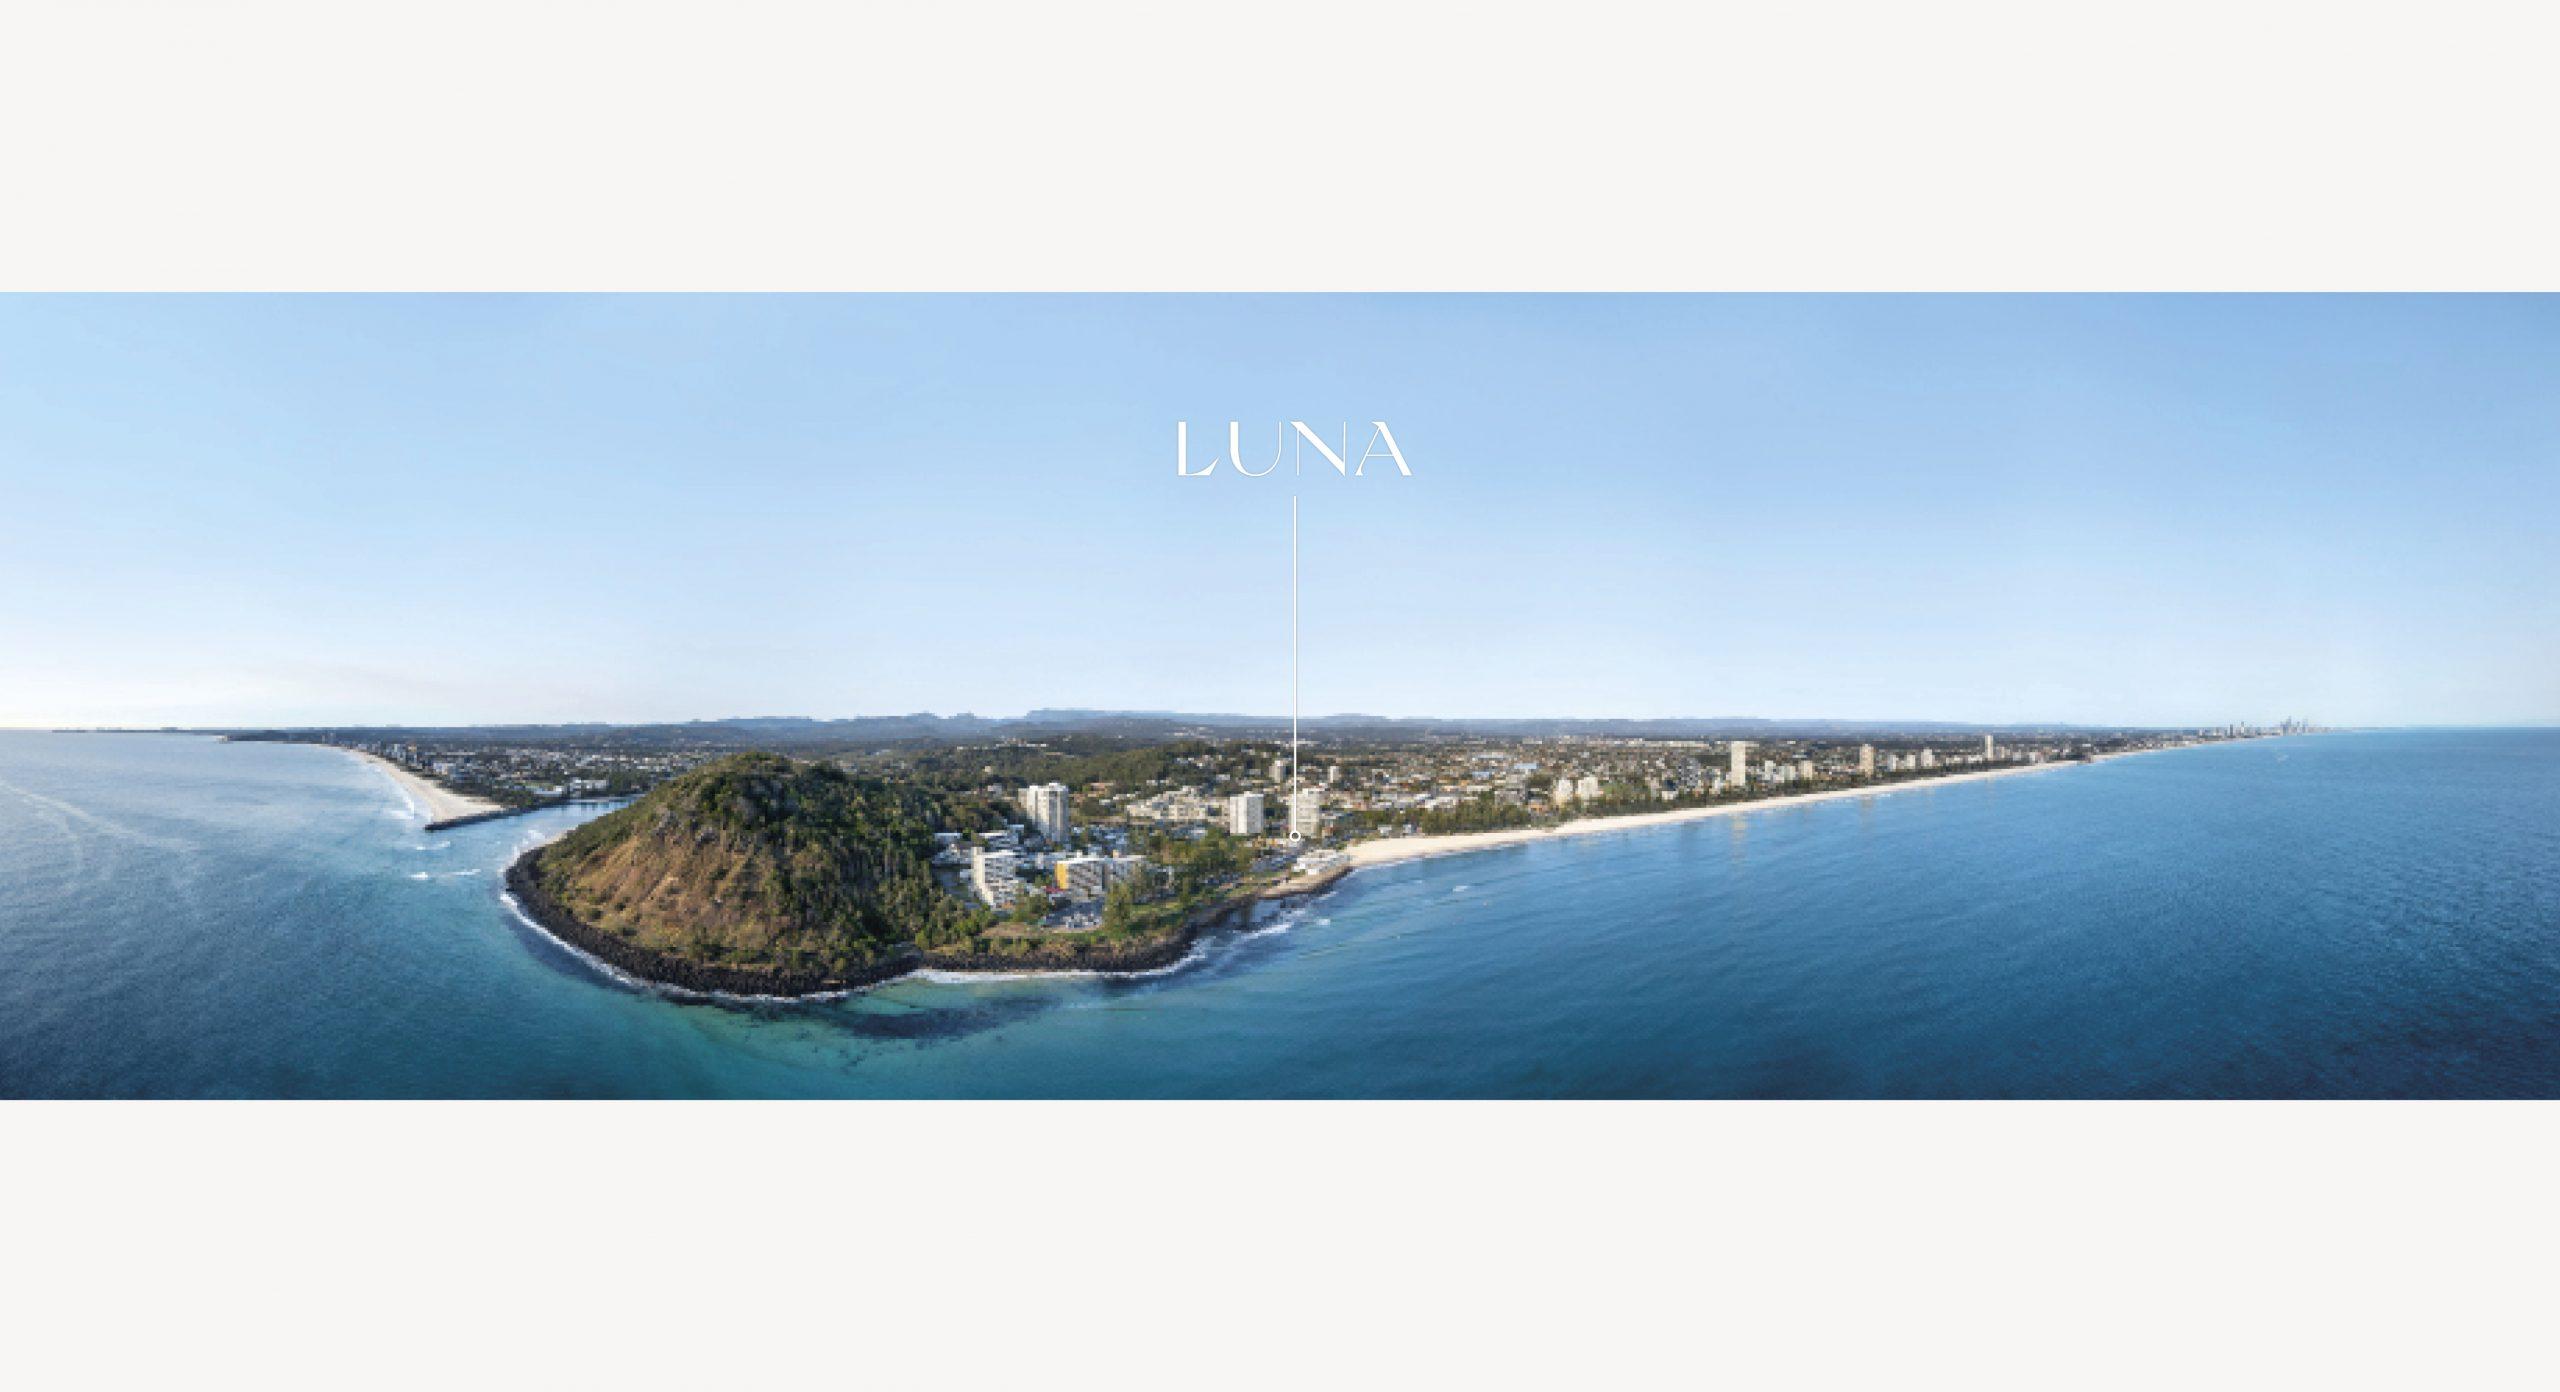 Luna new 4